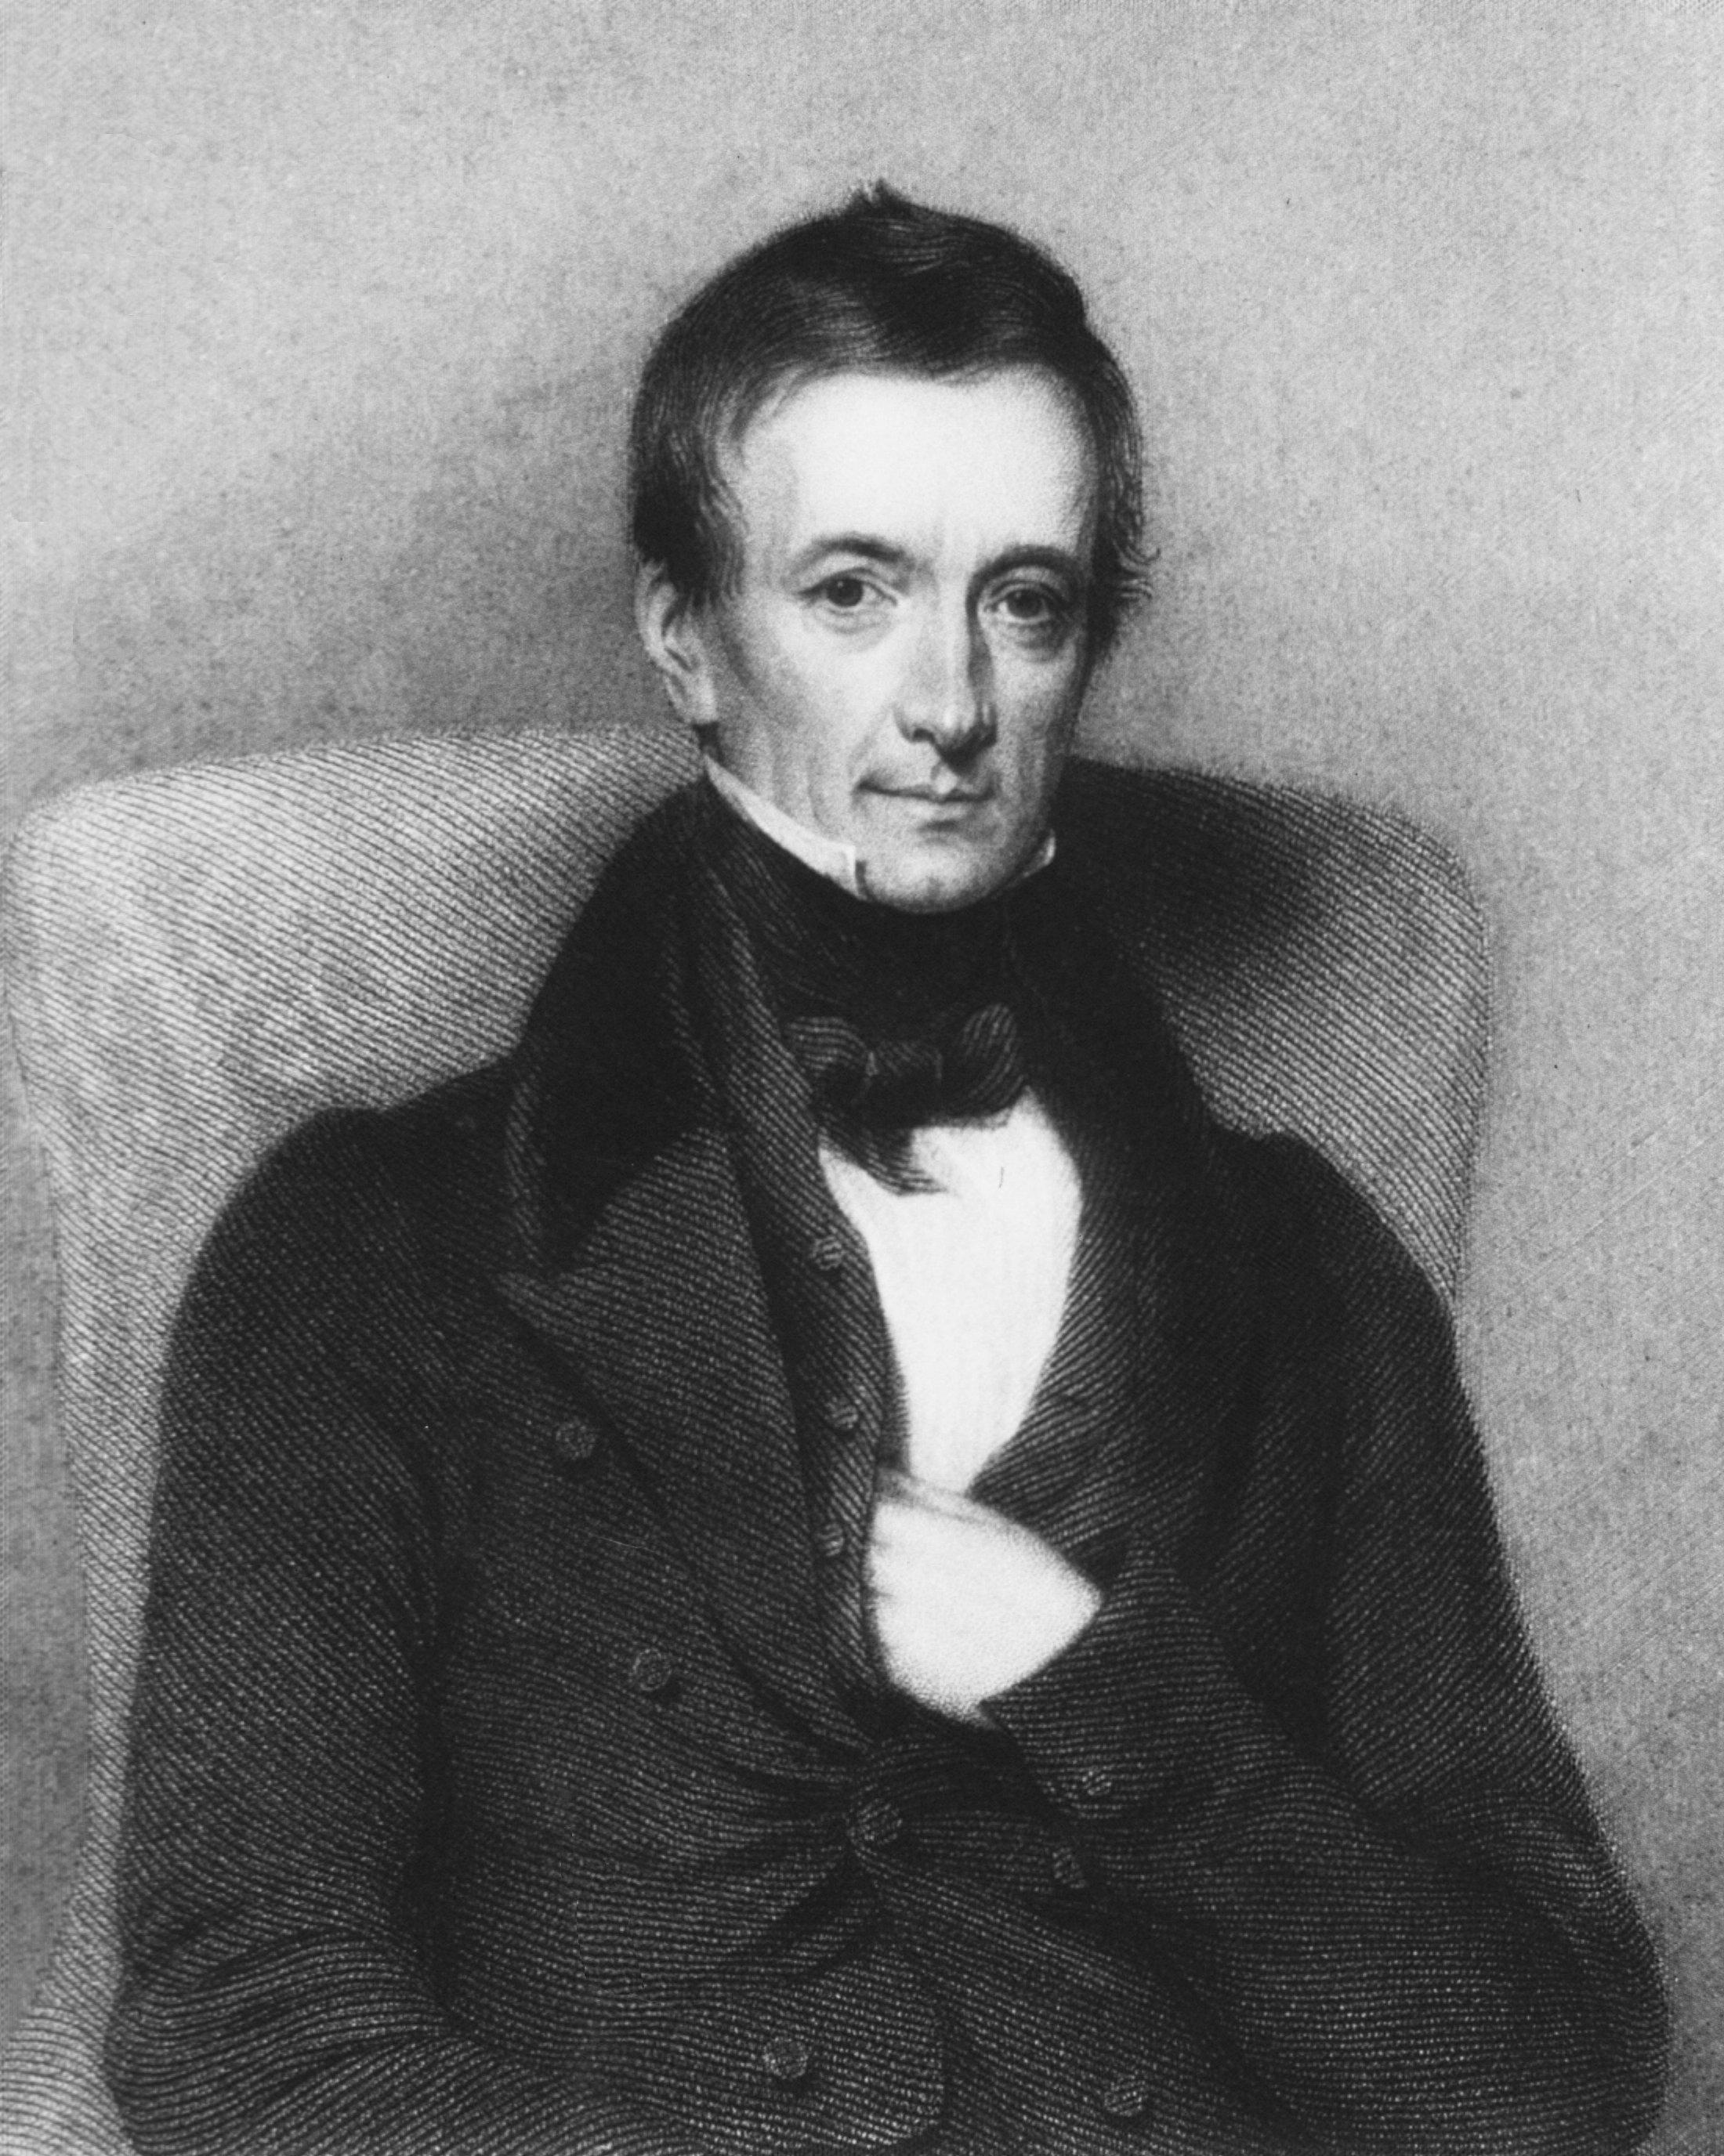 Official portrait by [[Thomas Pettigrew]]